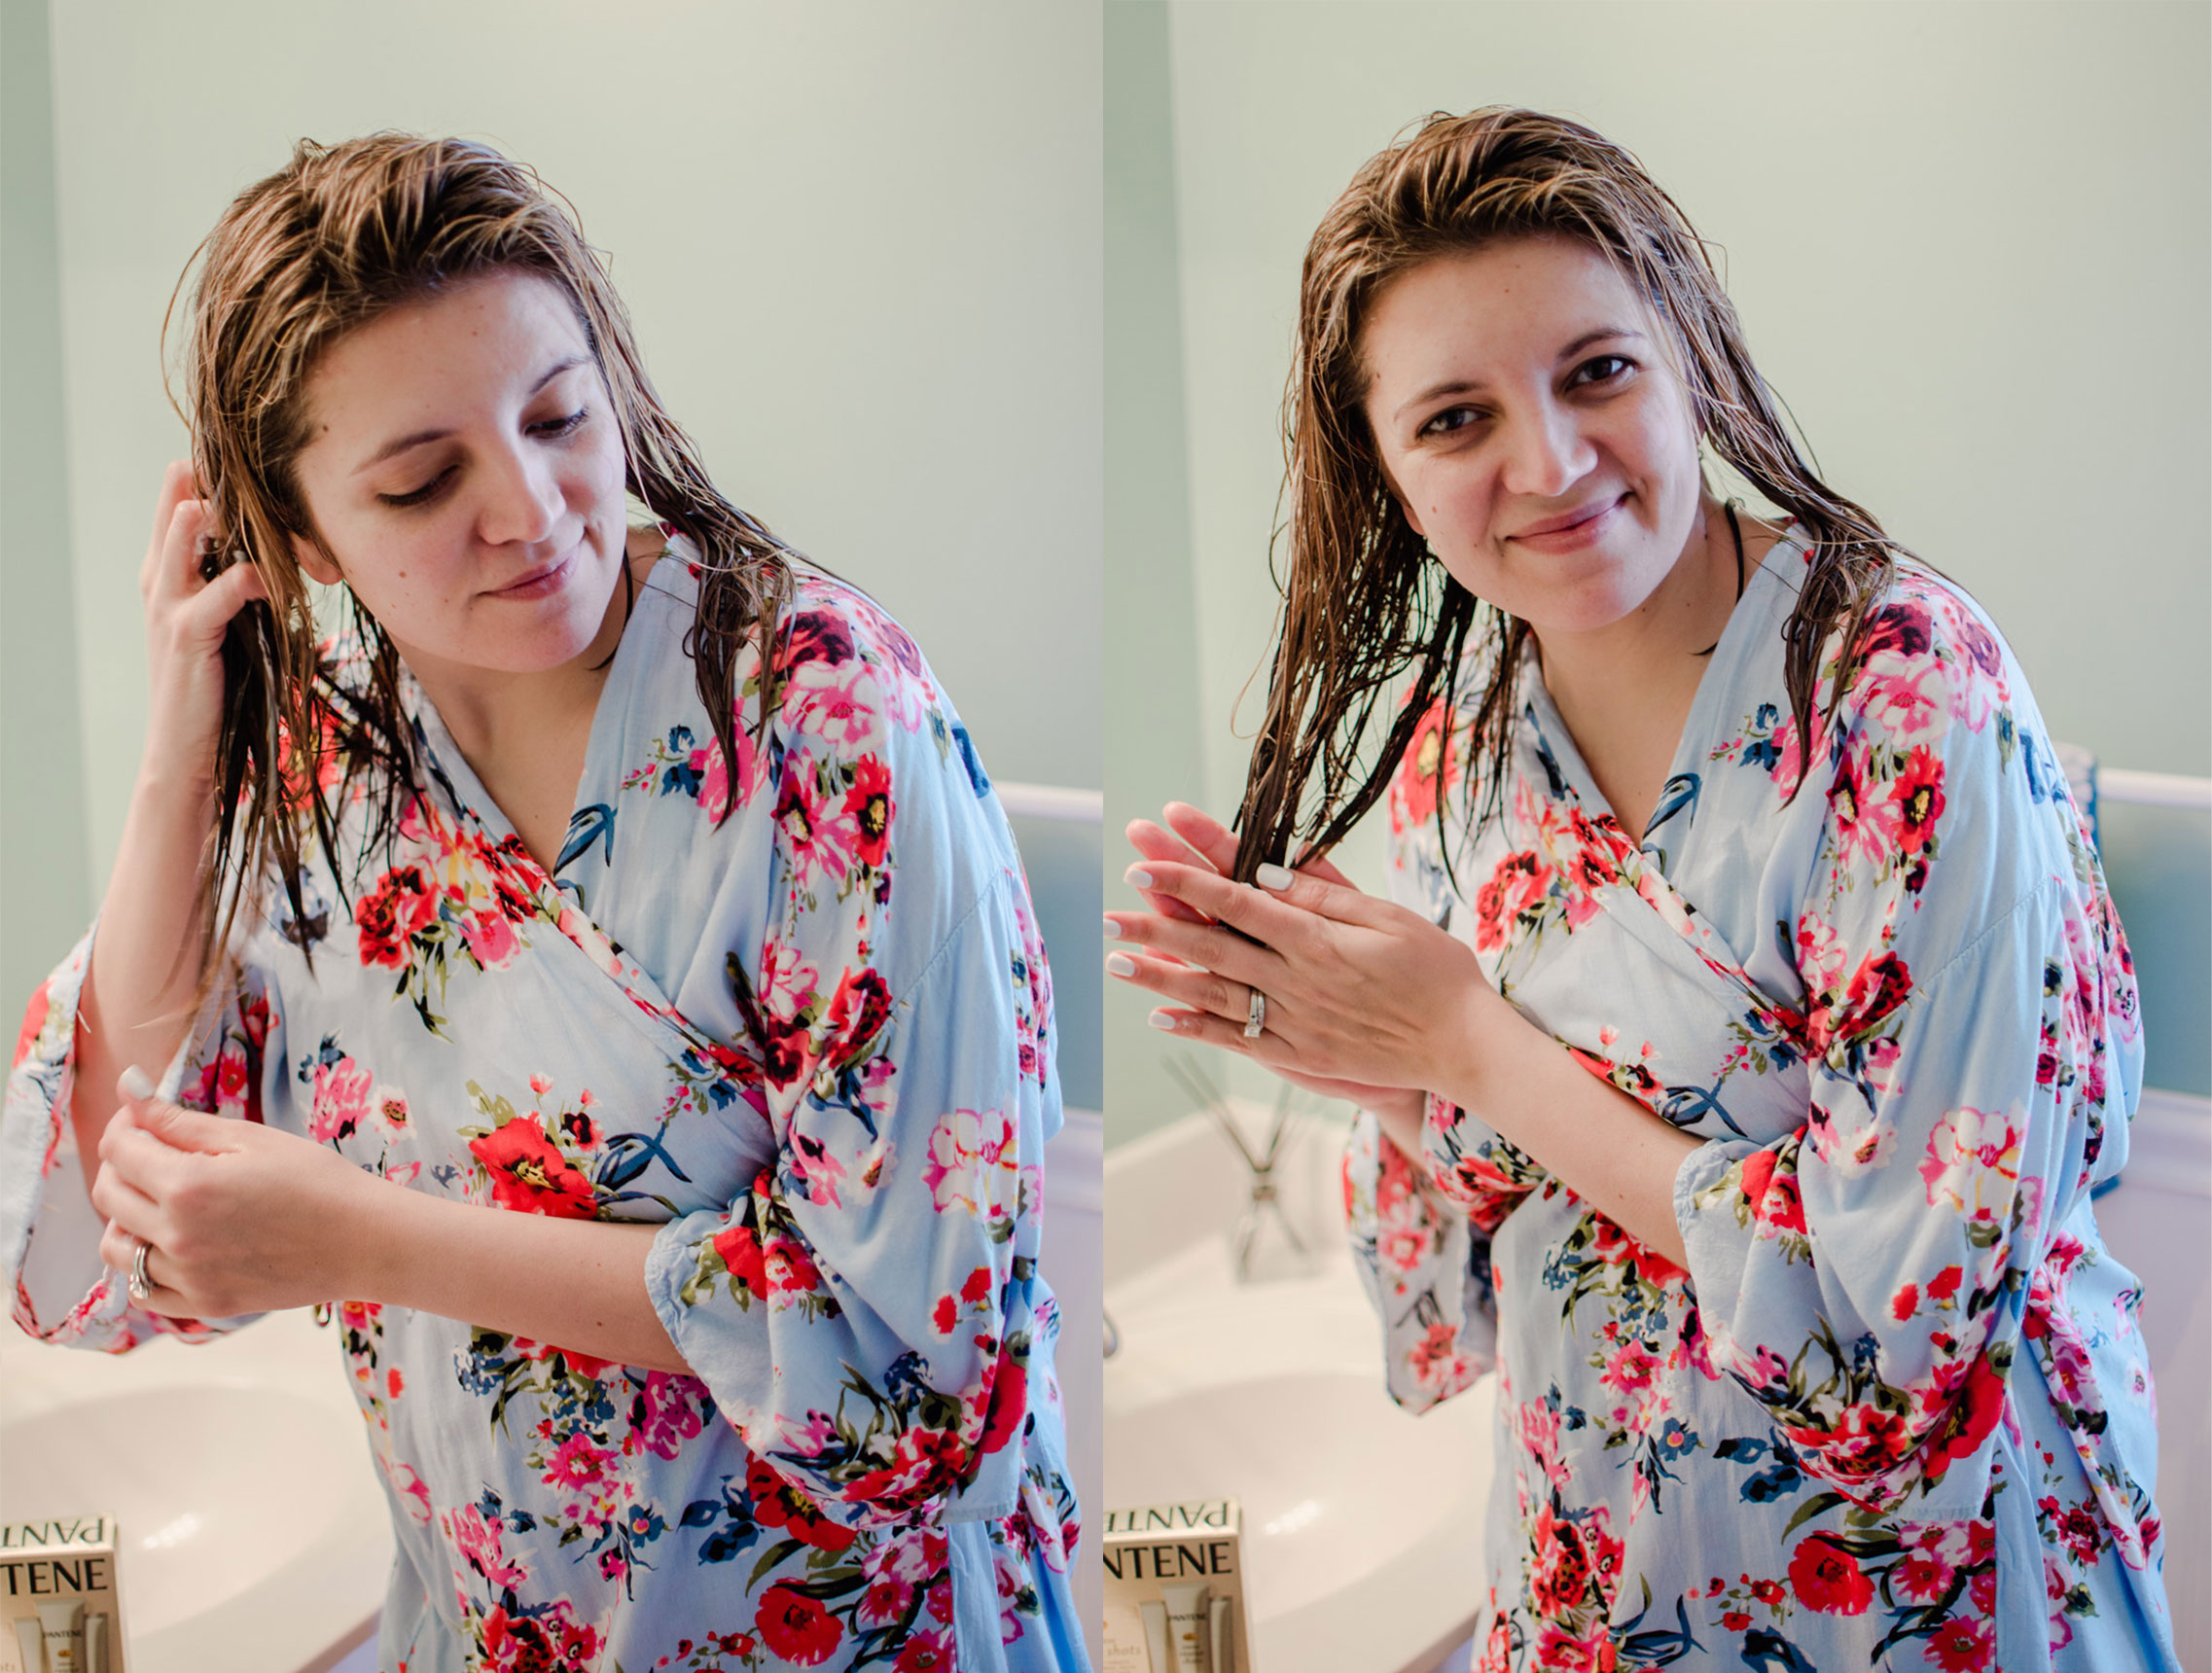 Richmond Virginia blogger, Lauren Dix, shares how she deep conditioners her hair using Pantene Intense Rescue Shots.